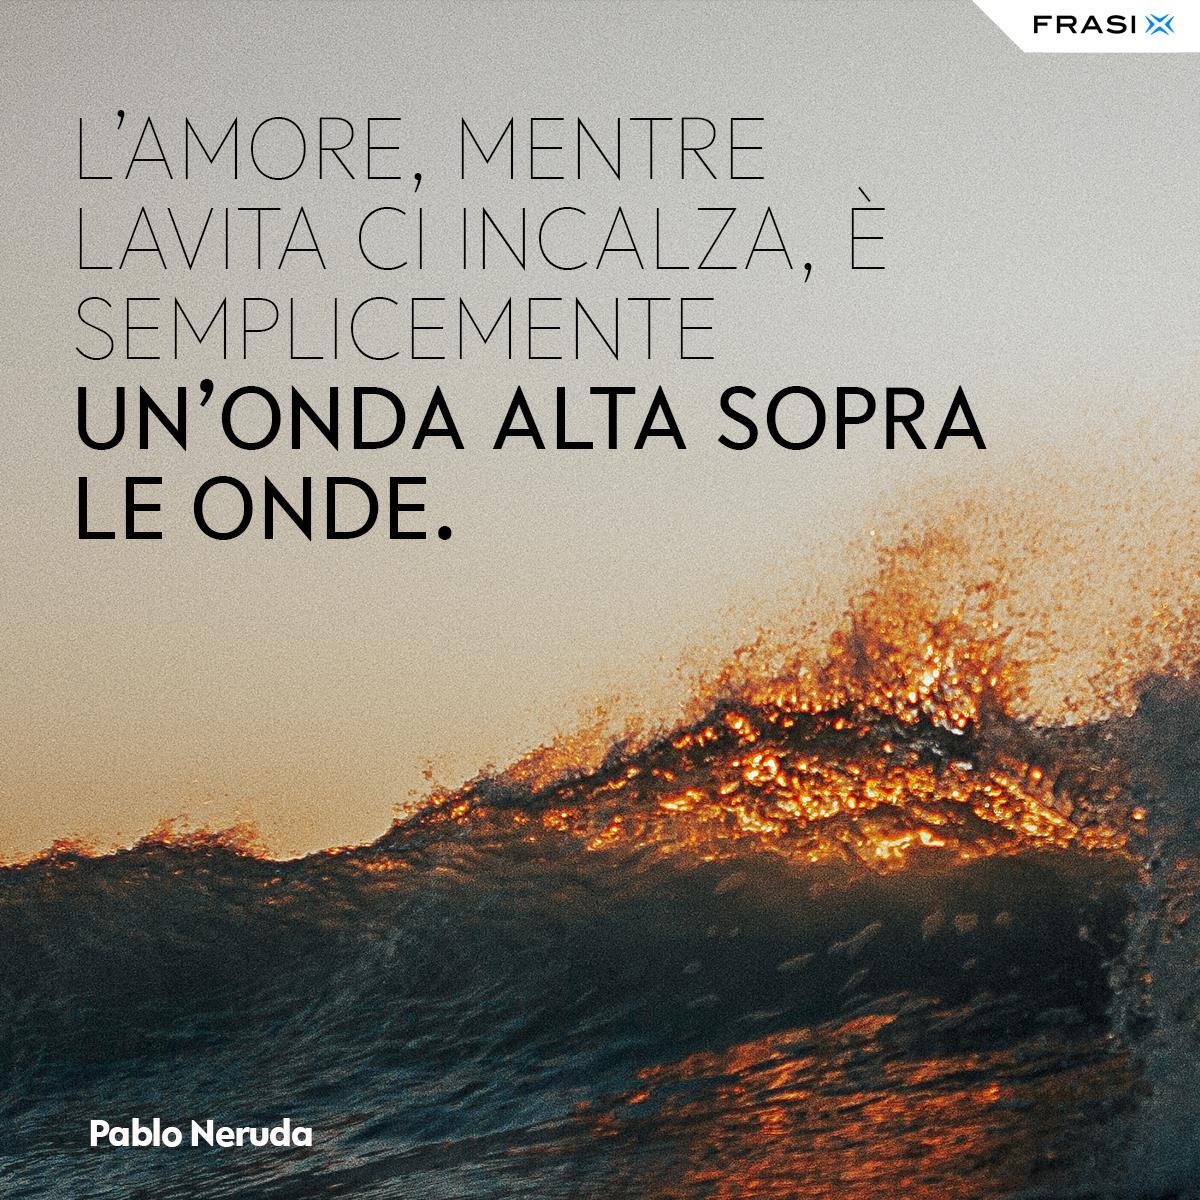 Aforismi amore Pablo Neruda